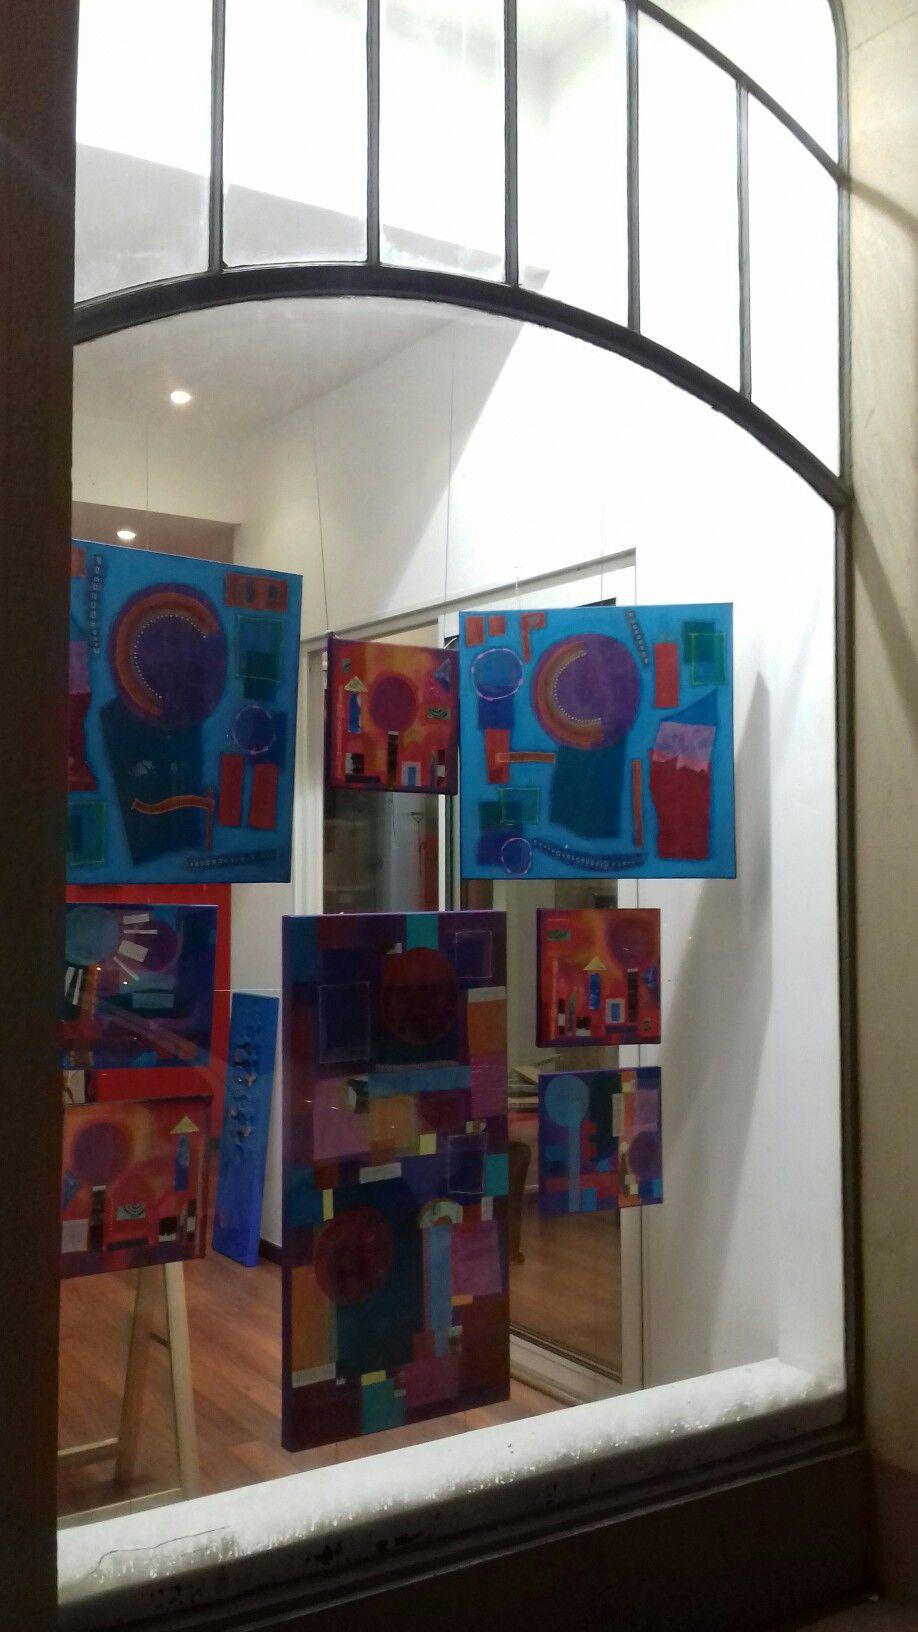 Kathleen Gilroy artwork.  My work on show. Amusons La Galerie Douai kathleengilroy.net